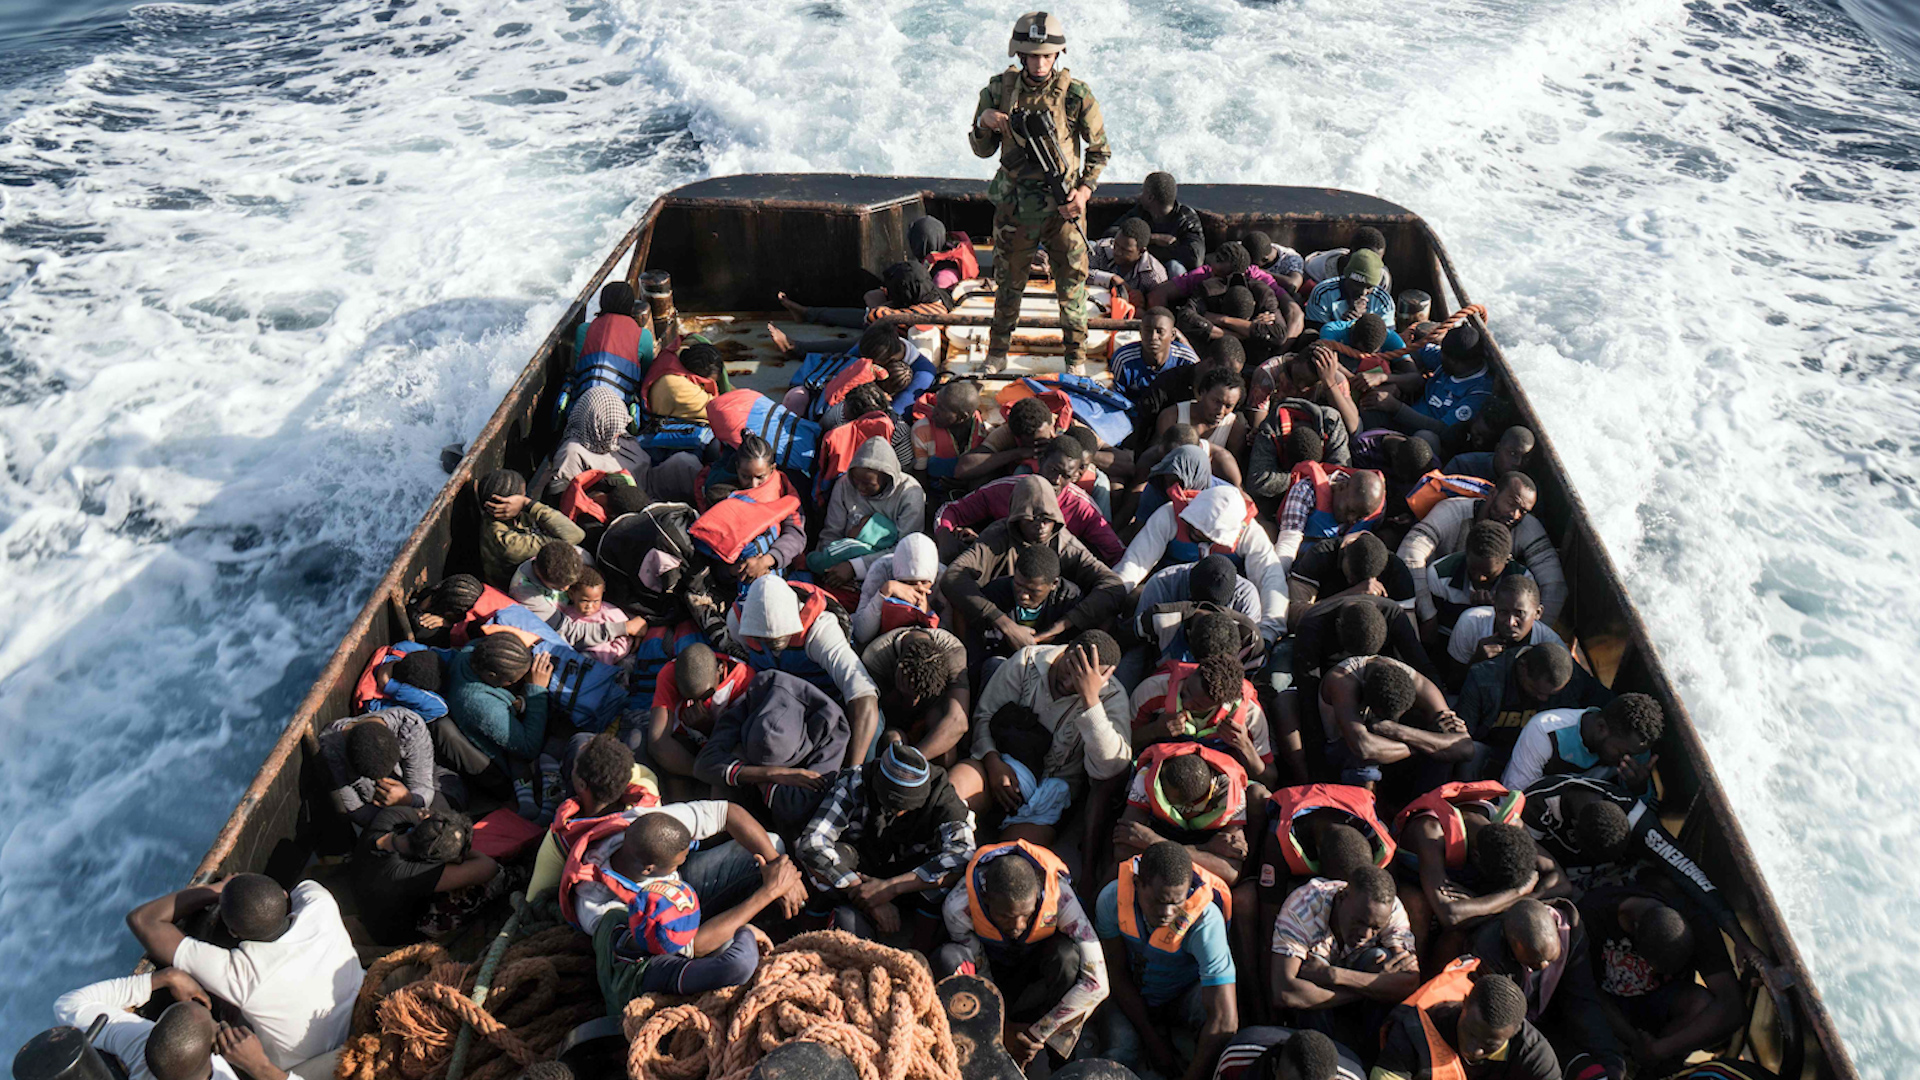 Libya's coast guard abuses migrants despite E.U. funding and training